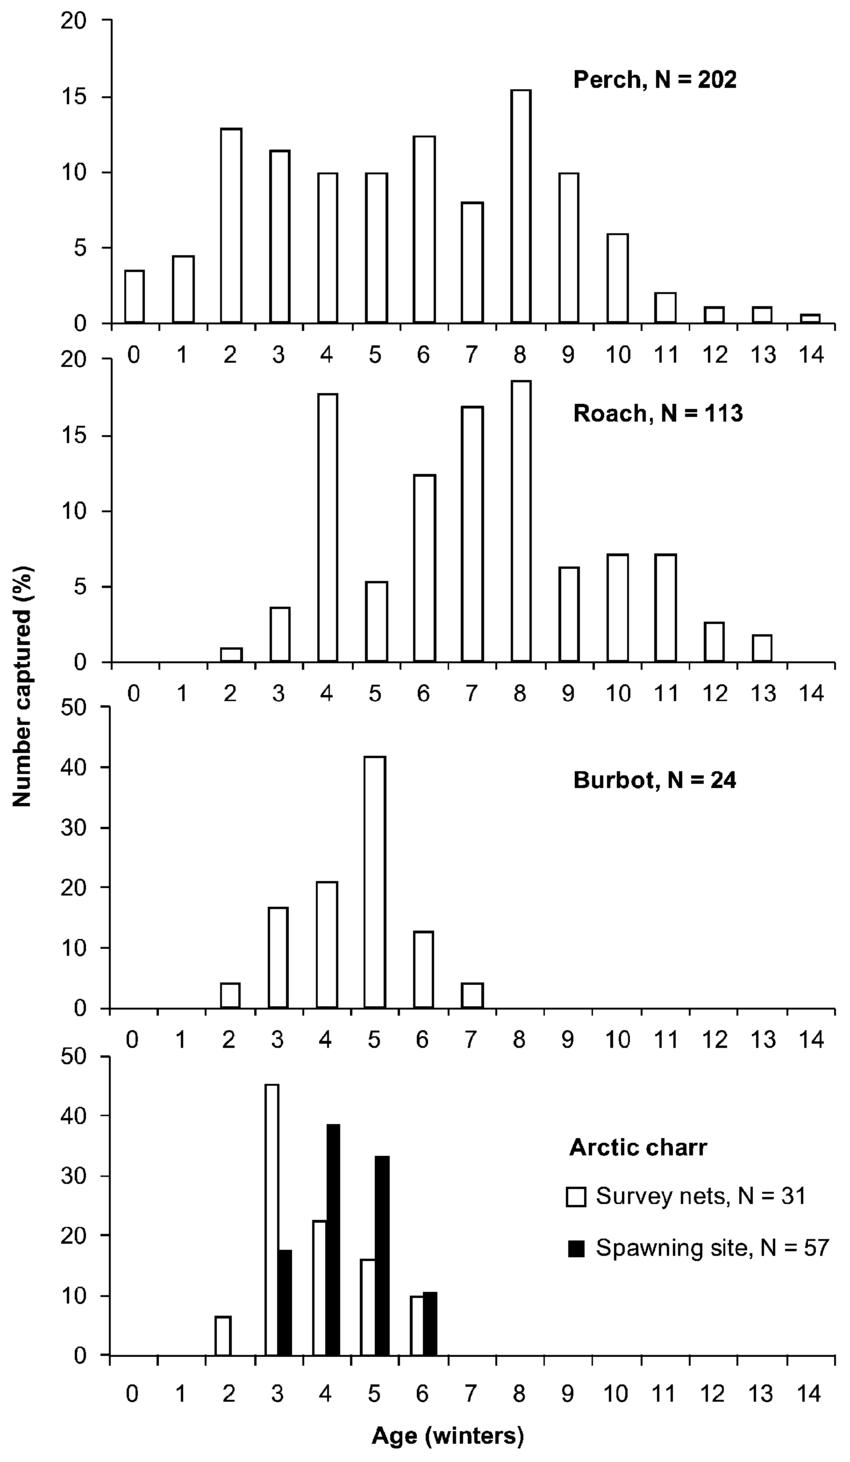 hight resolution of age distribution of perch perca fluviatilis roach rutilus rutilus burbot